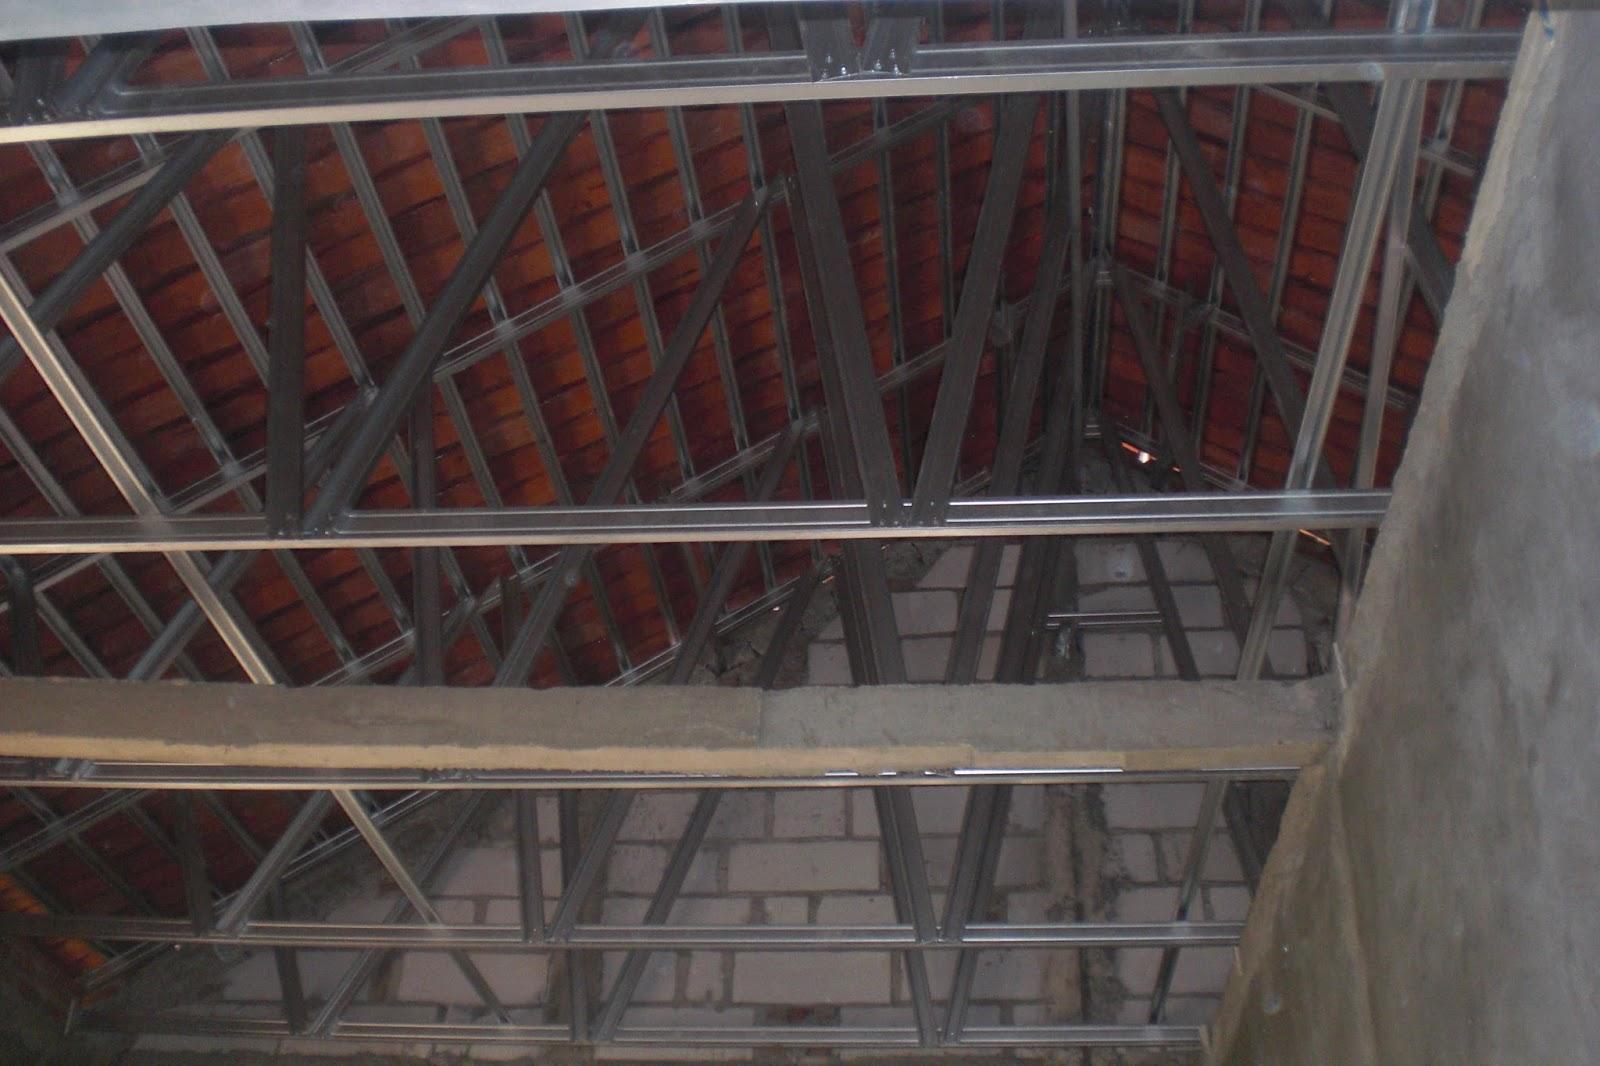 rangka baja ringan untuk atap asbes pemasangan di perumahaan vila ...